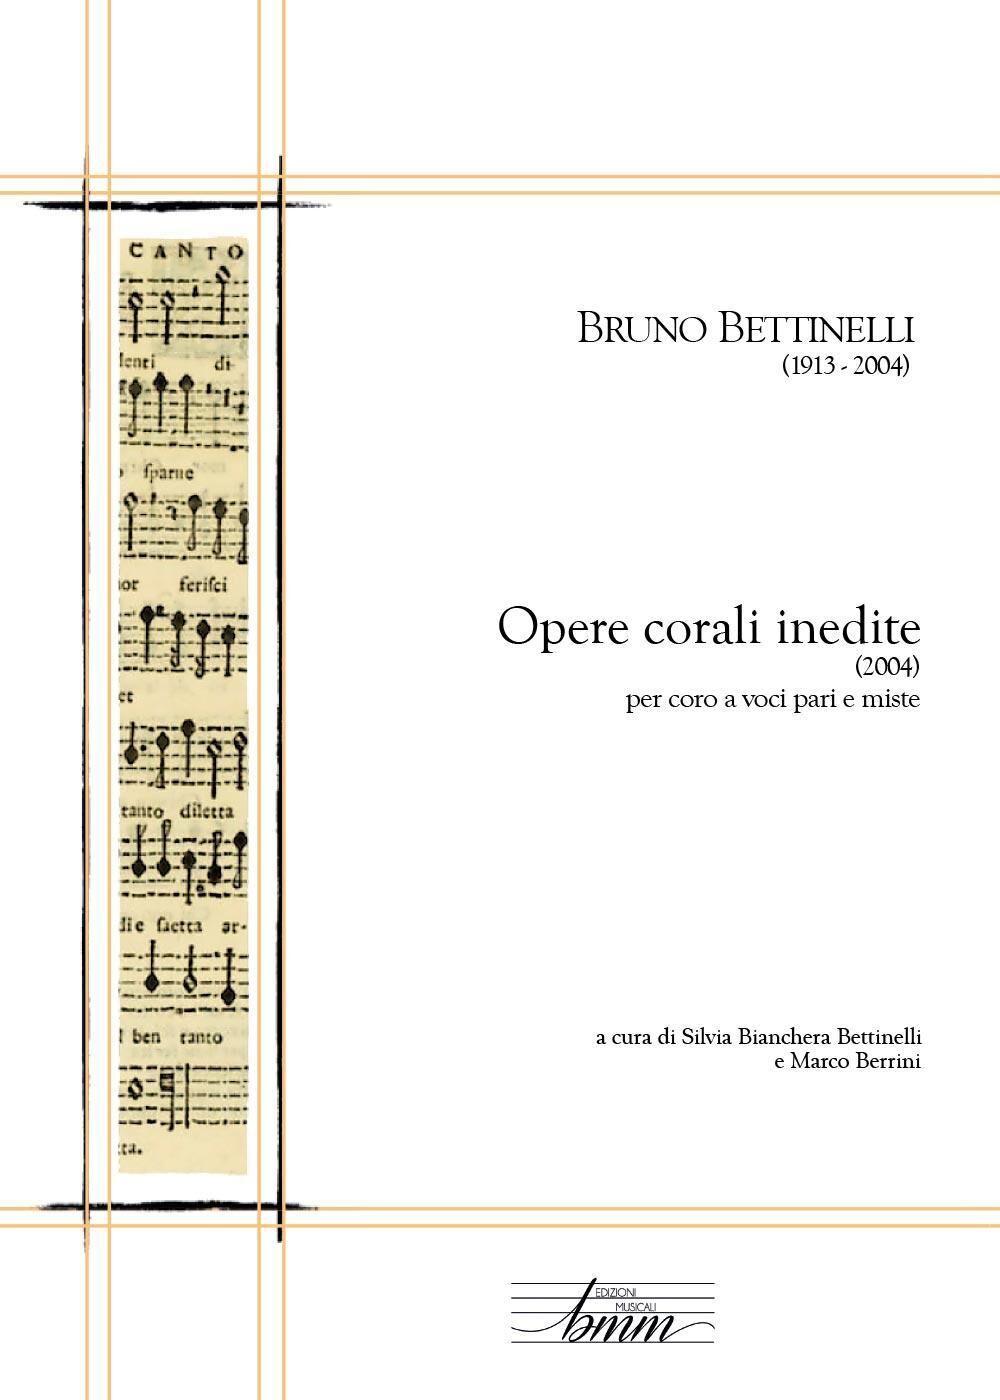 Bruno Bettinelli. Opere corali inedite